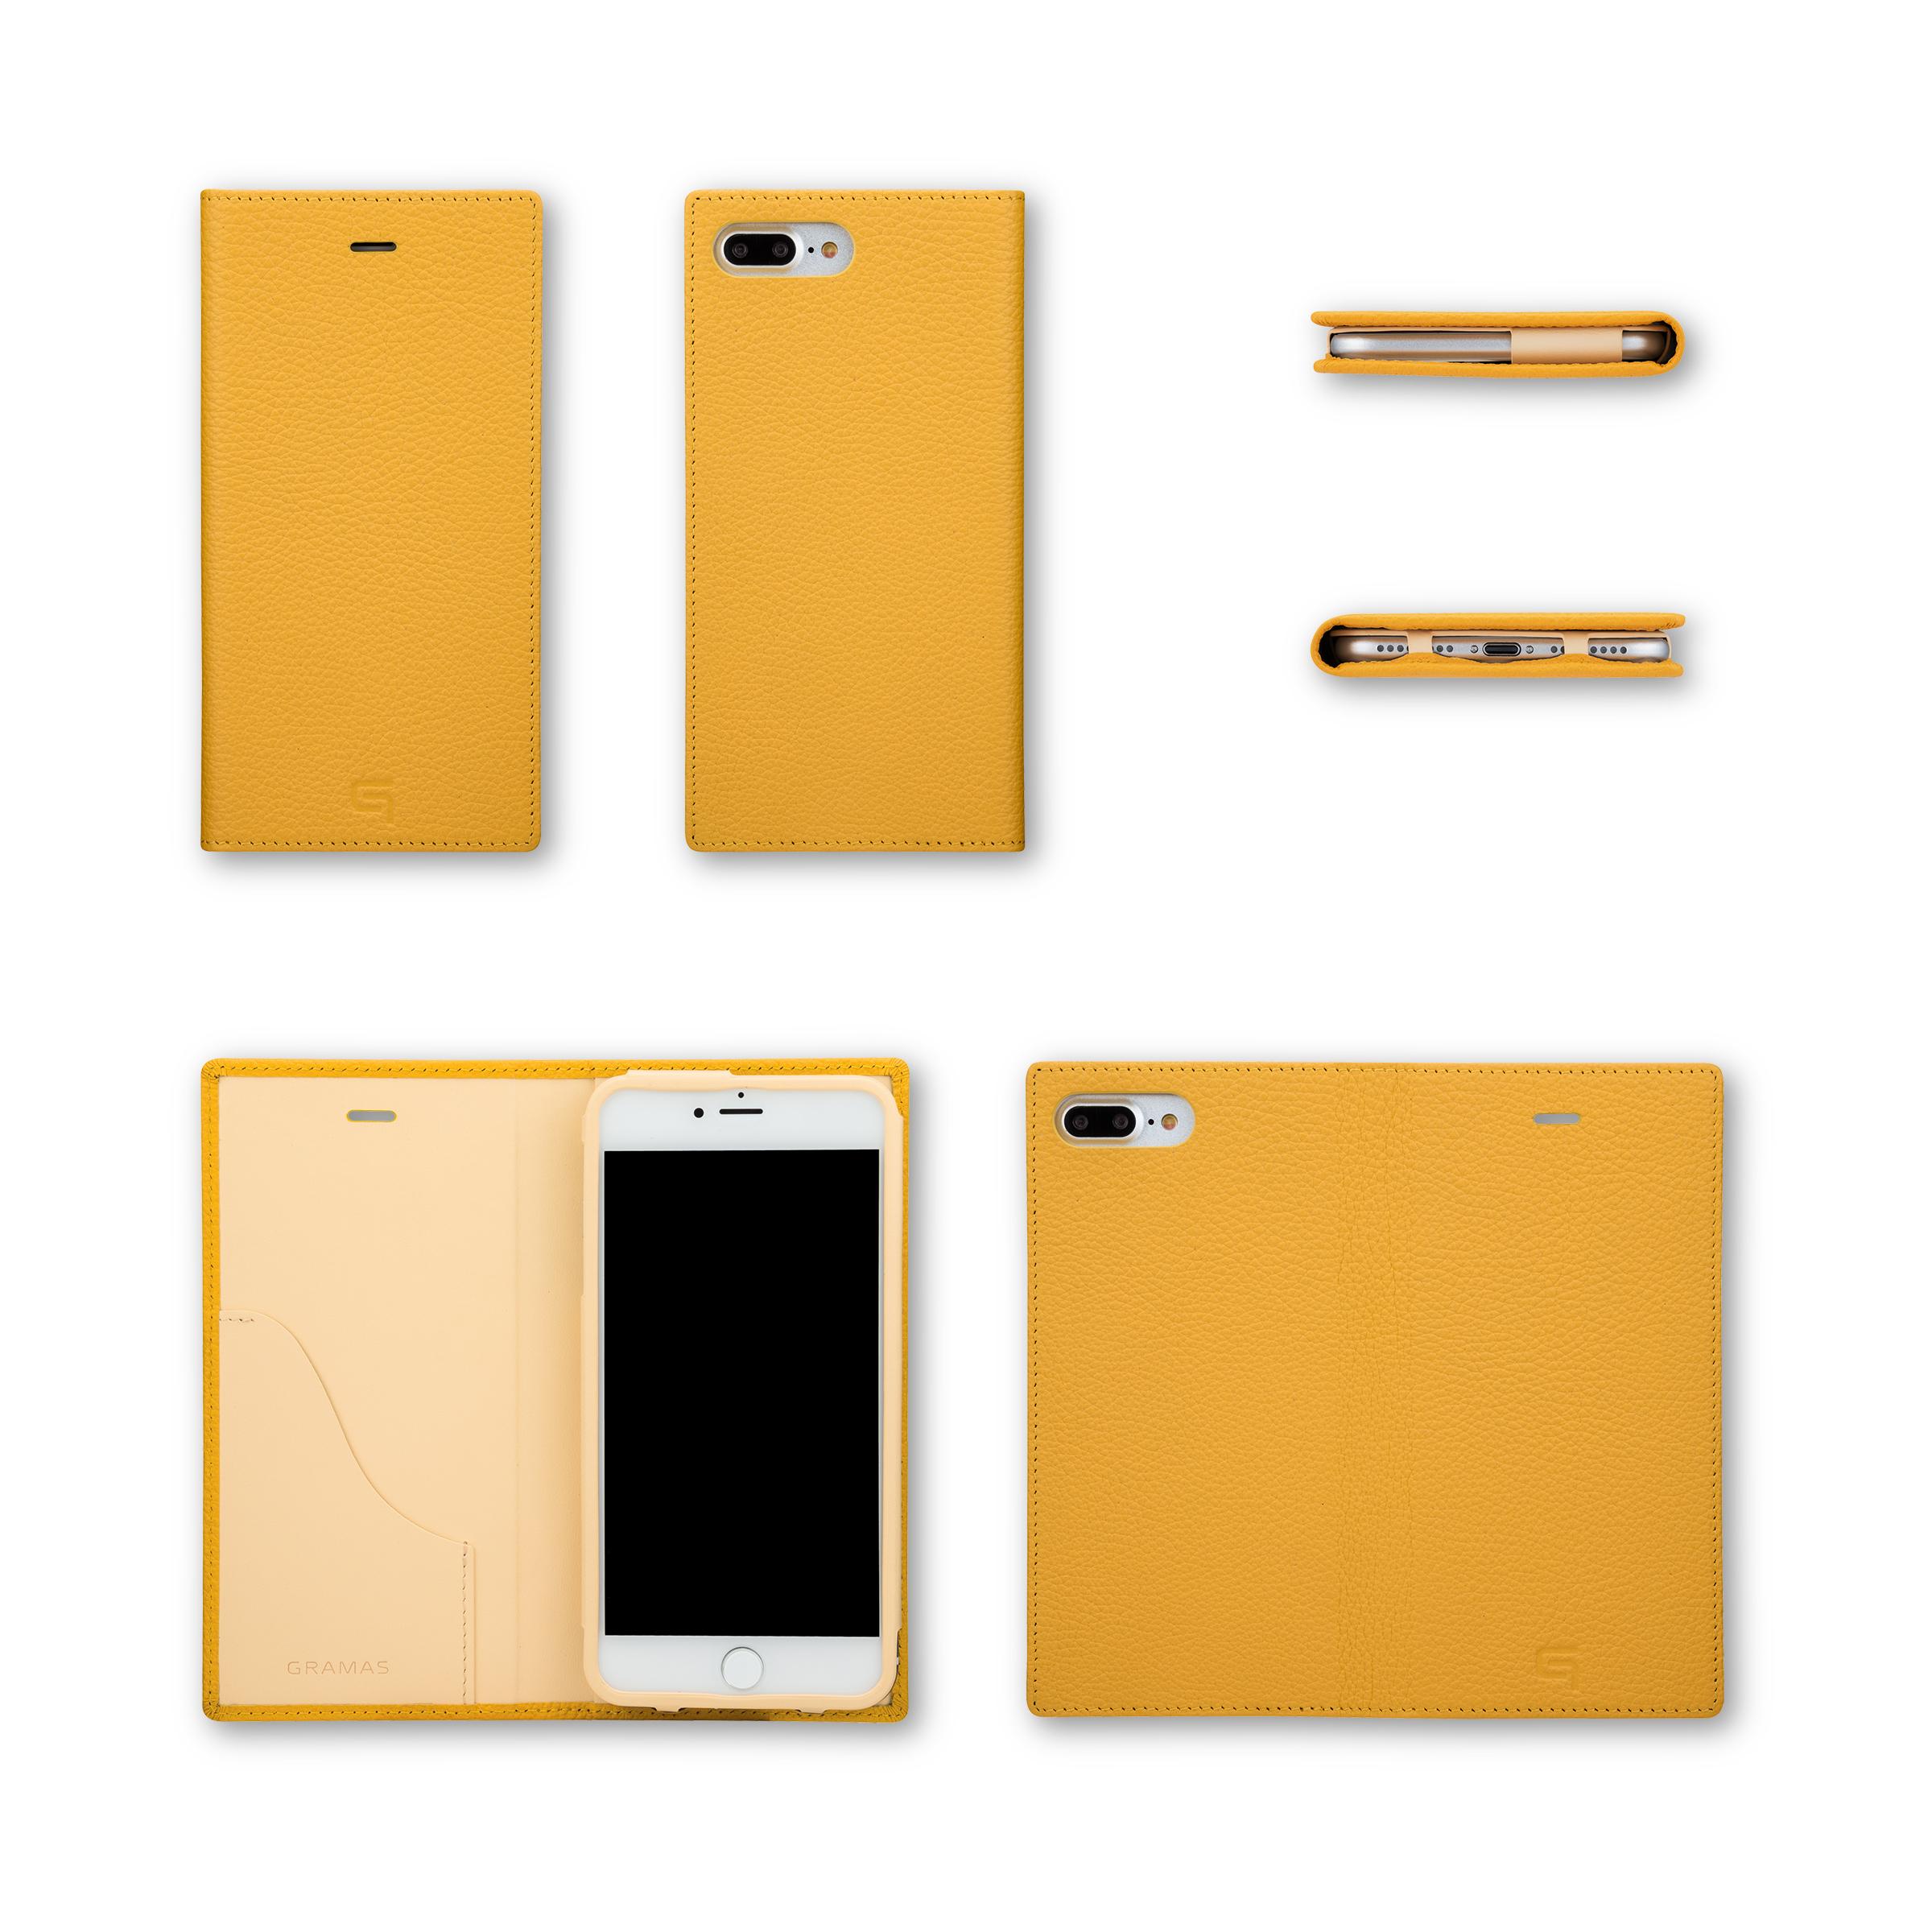 GRAMAS Shrunken-calf Full Leather Case for iPhone 7 Plus(Pink) シュランケンカーフ 手帳型フルレザーケース - 画像5